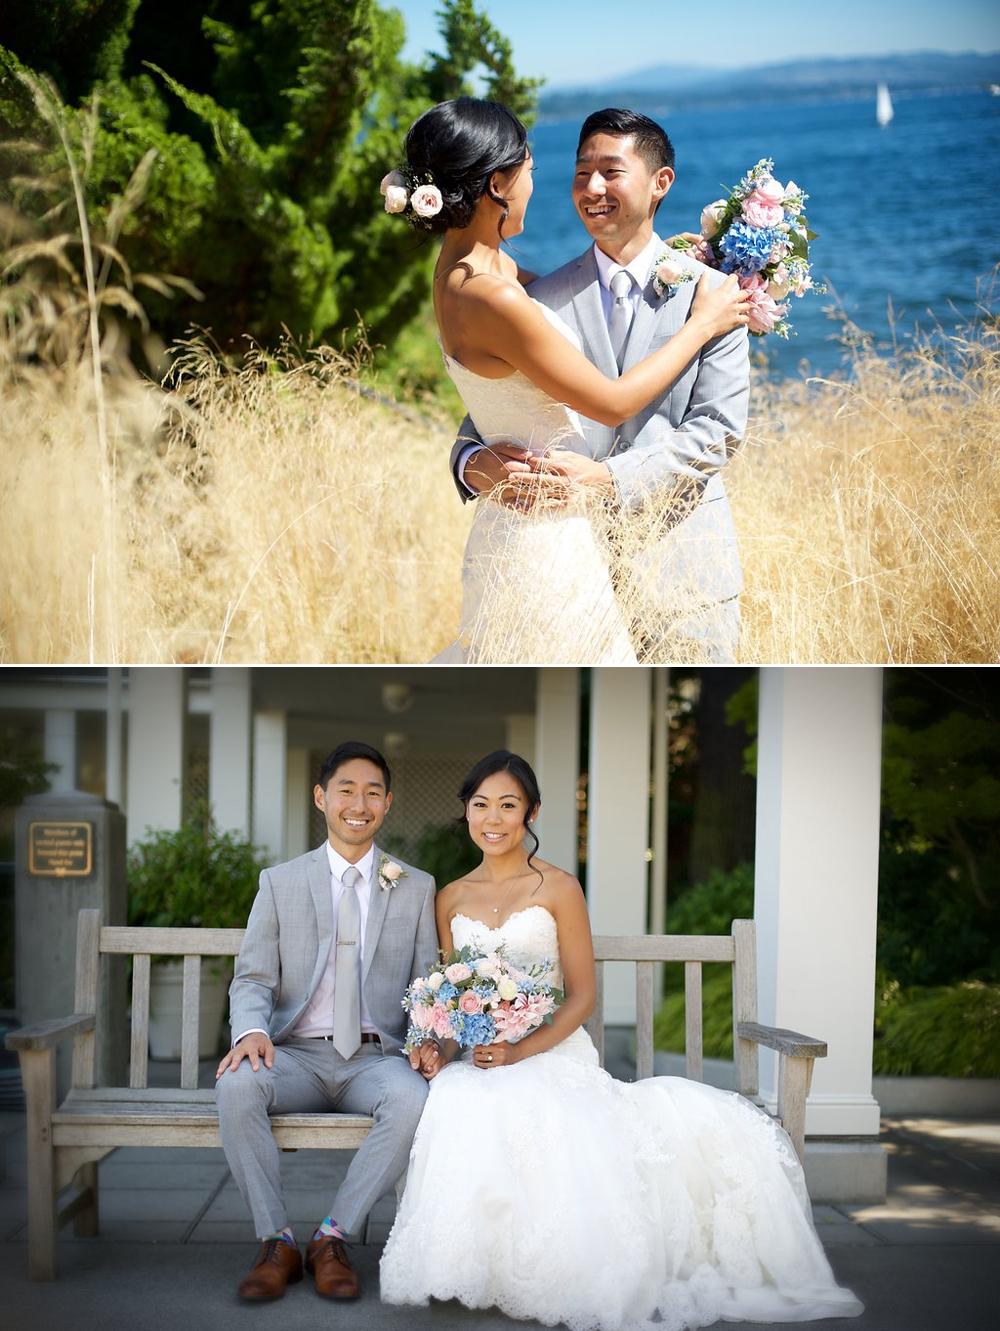 blue-and-blush-wedding-seattle-tennis-club 8.jpg